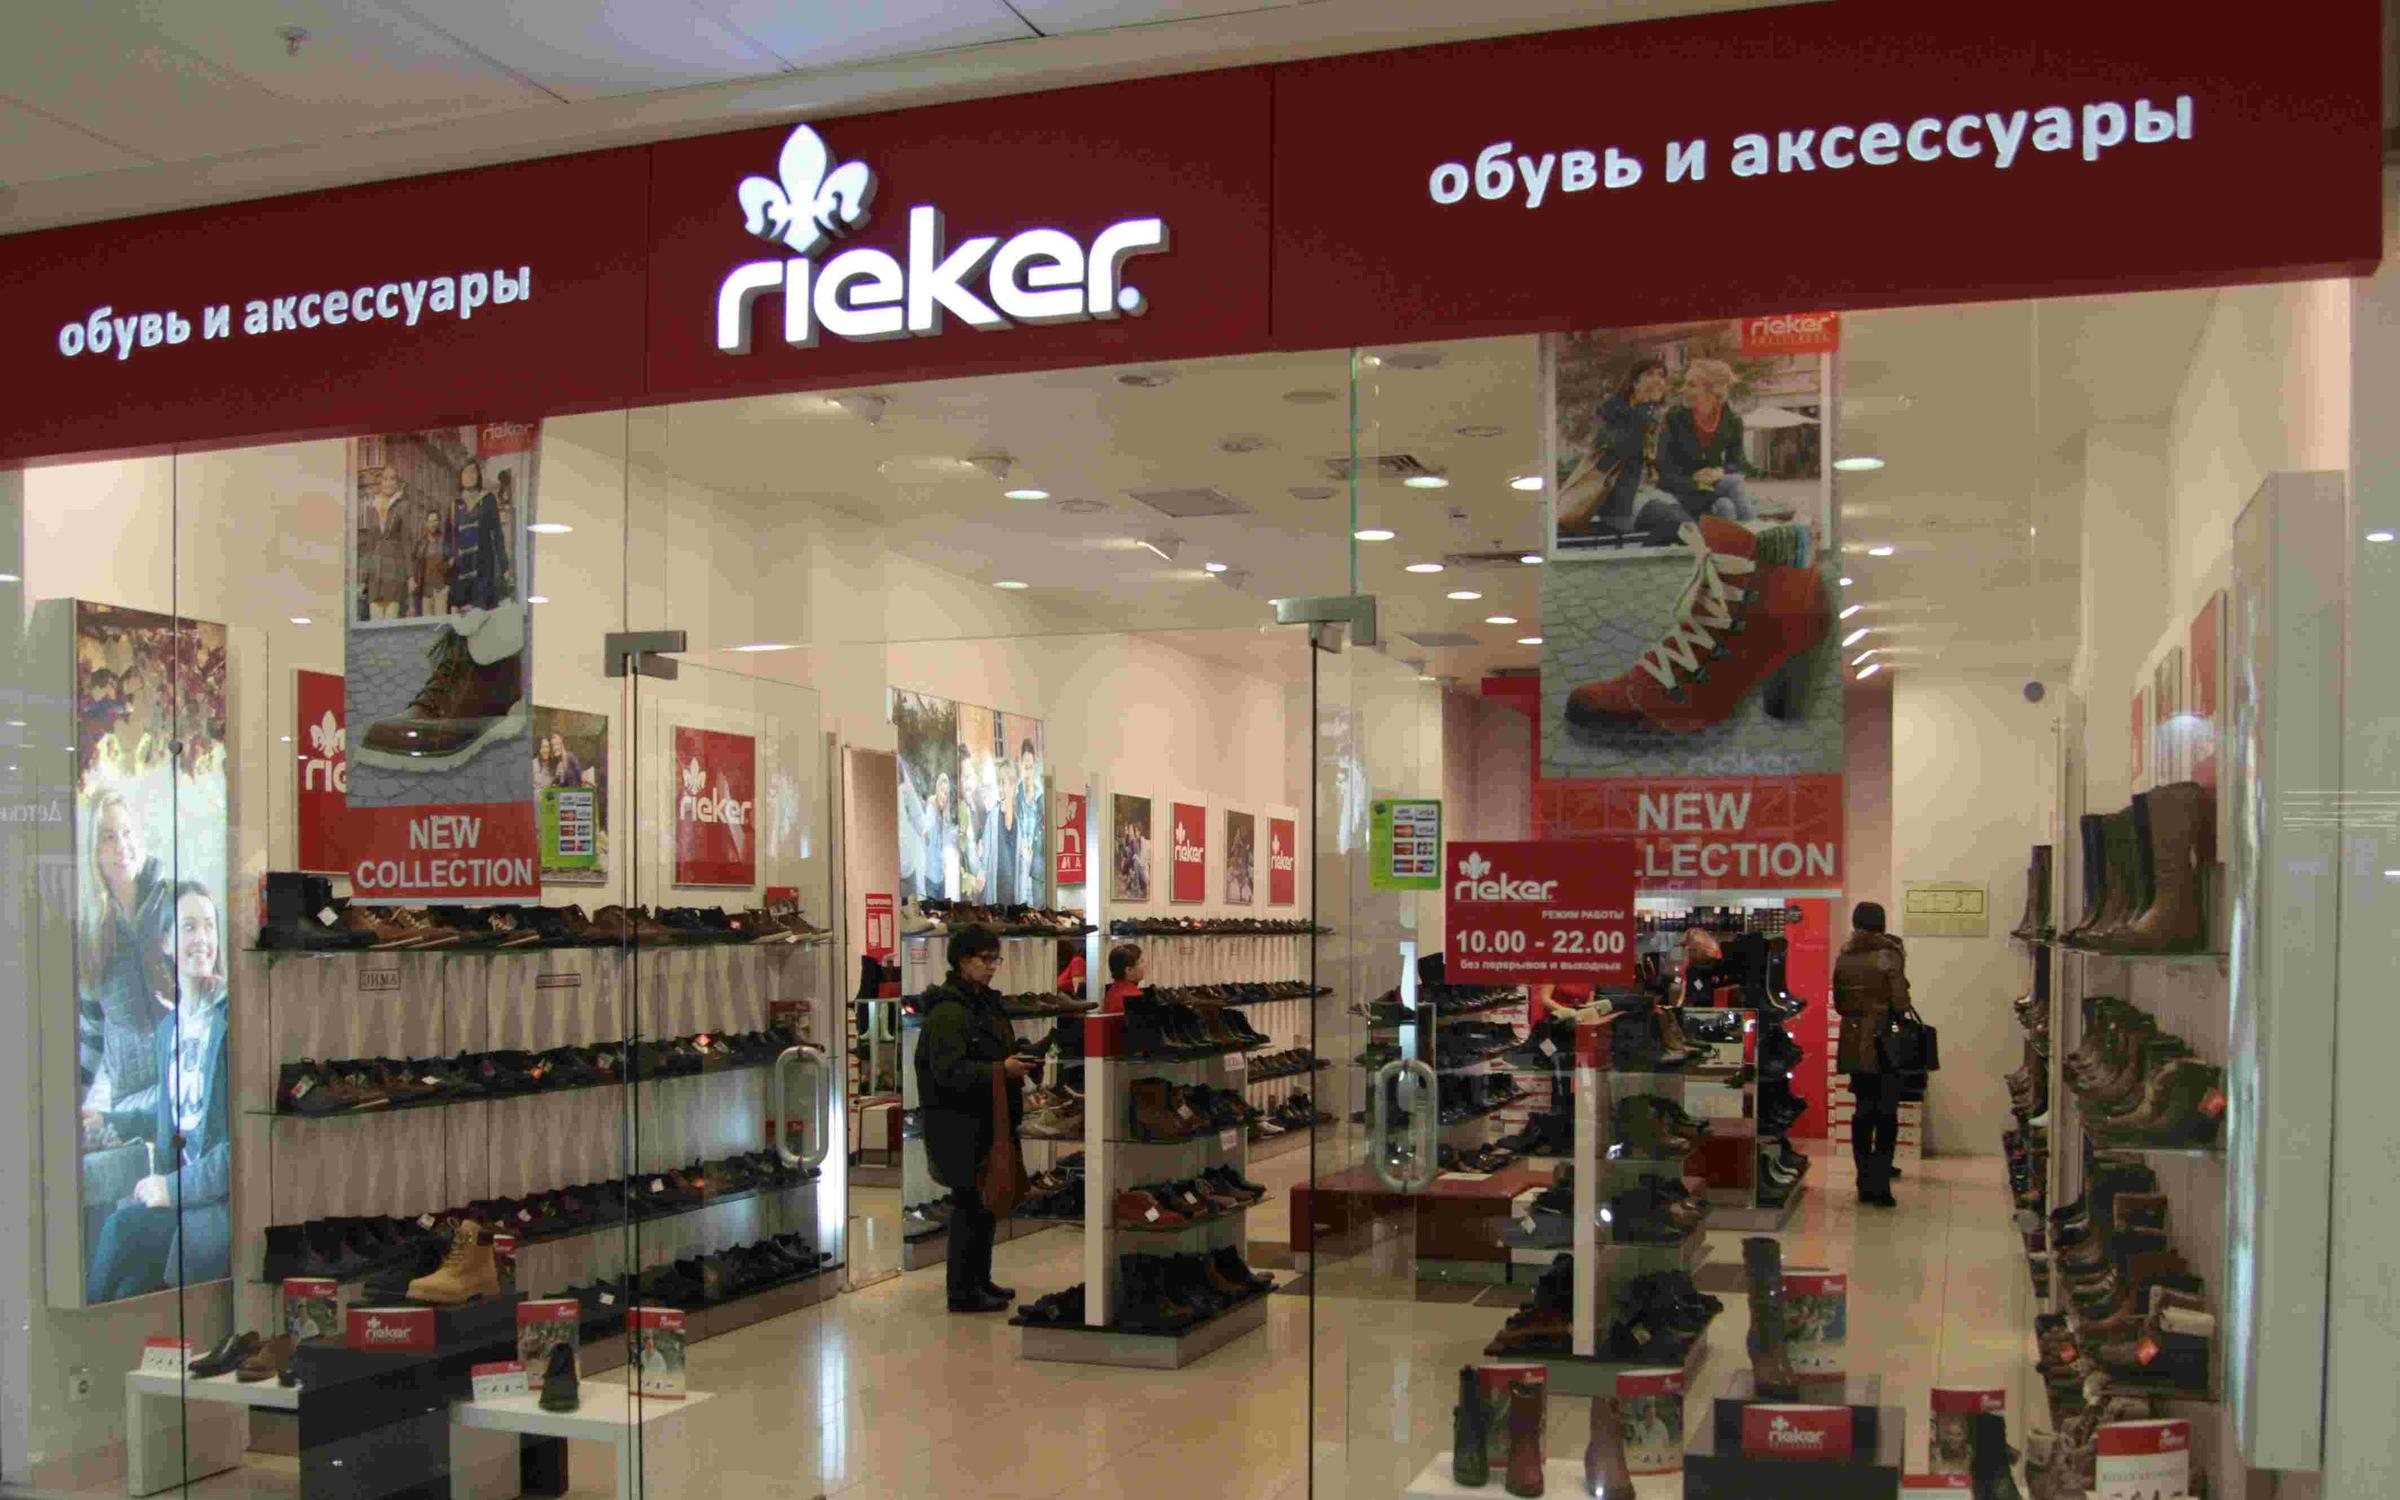 8e95188e7 Салон обуви Rieker в ТЦ Вива Лэнд - отзывы, фото, каталог товаров, цены,  телефон, адрес и как добраться - Одежда и обувь - Самара - Zoon.ru